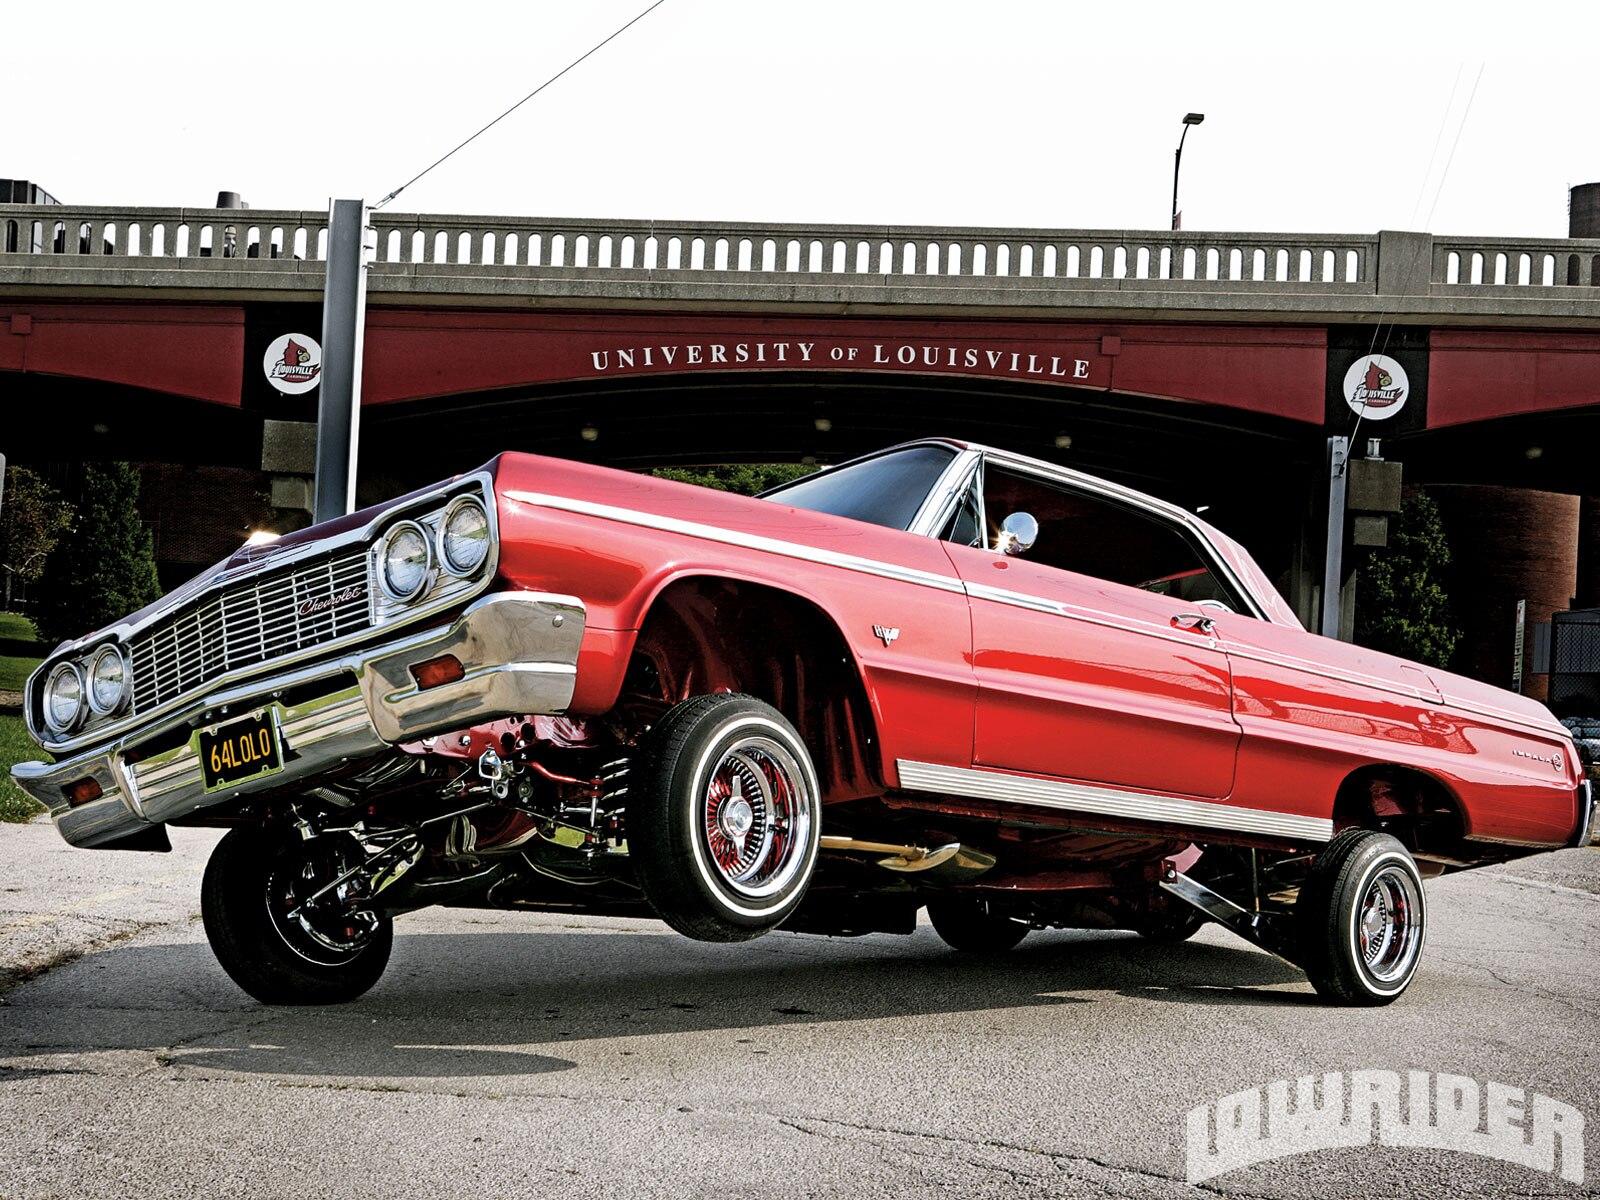 1002_lrmp_02_o-1964_chevrolet_impala-3_wheel_motion.jpg (1600×1200)